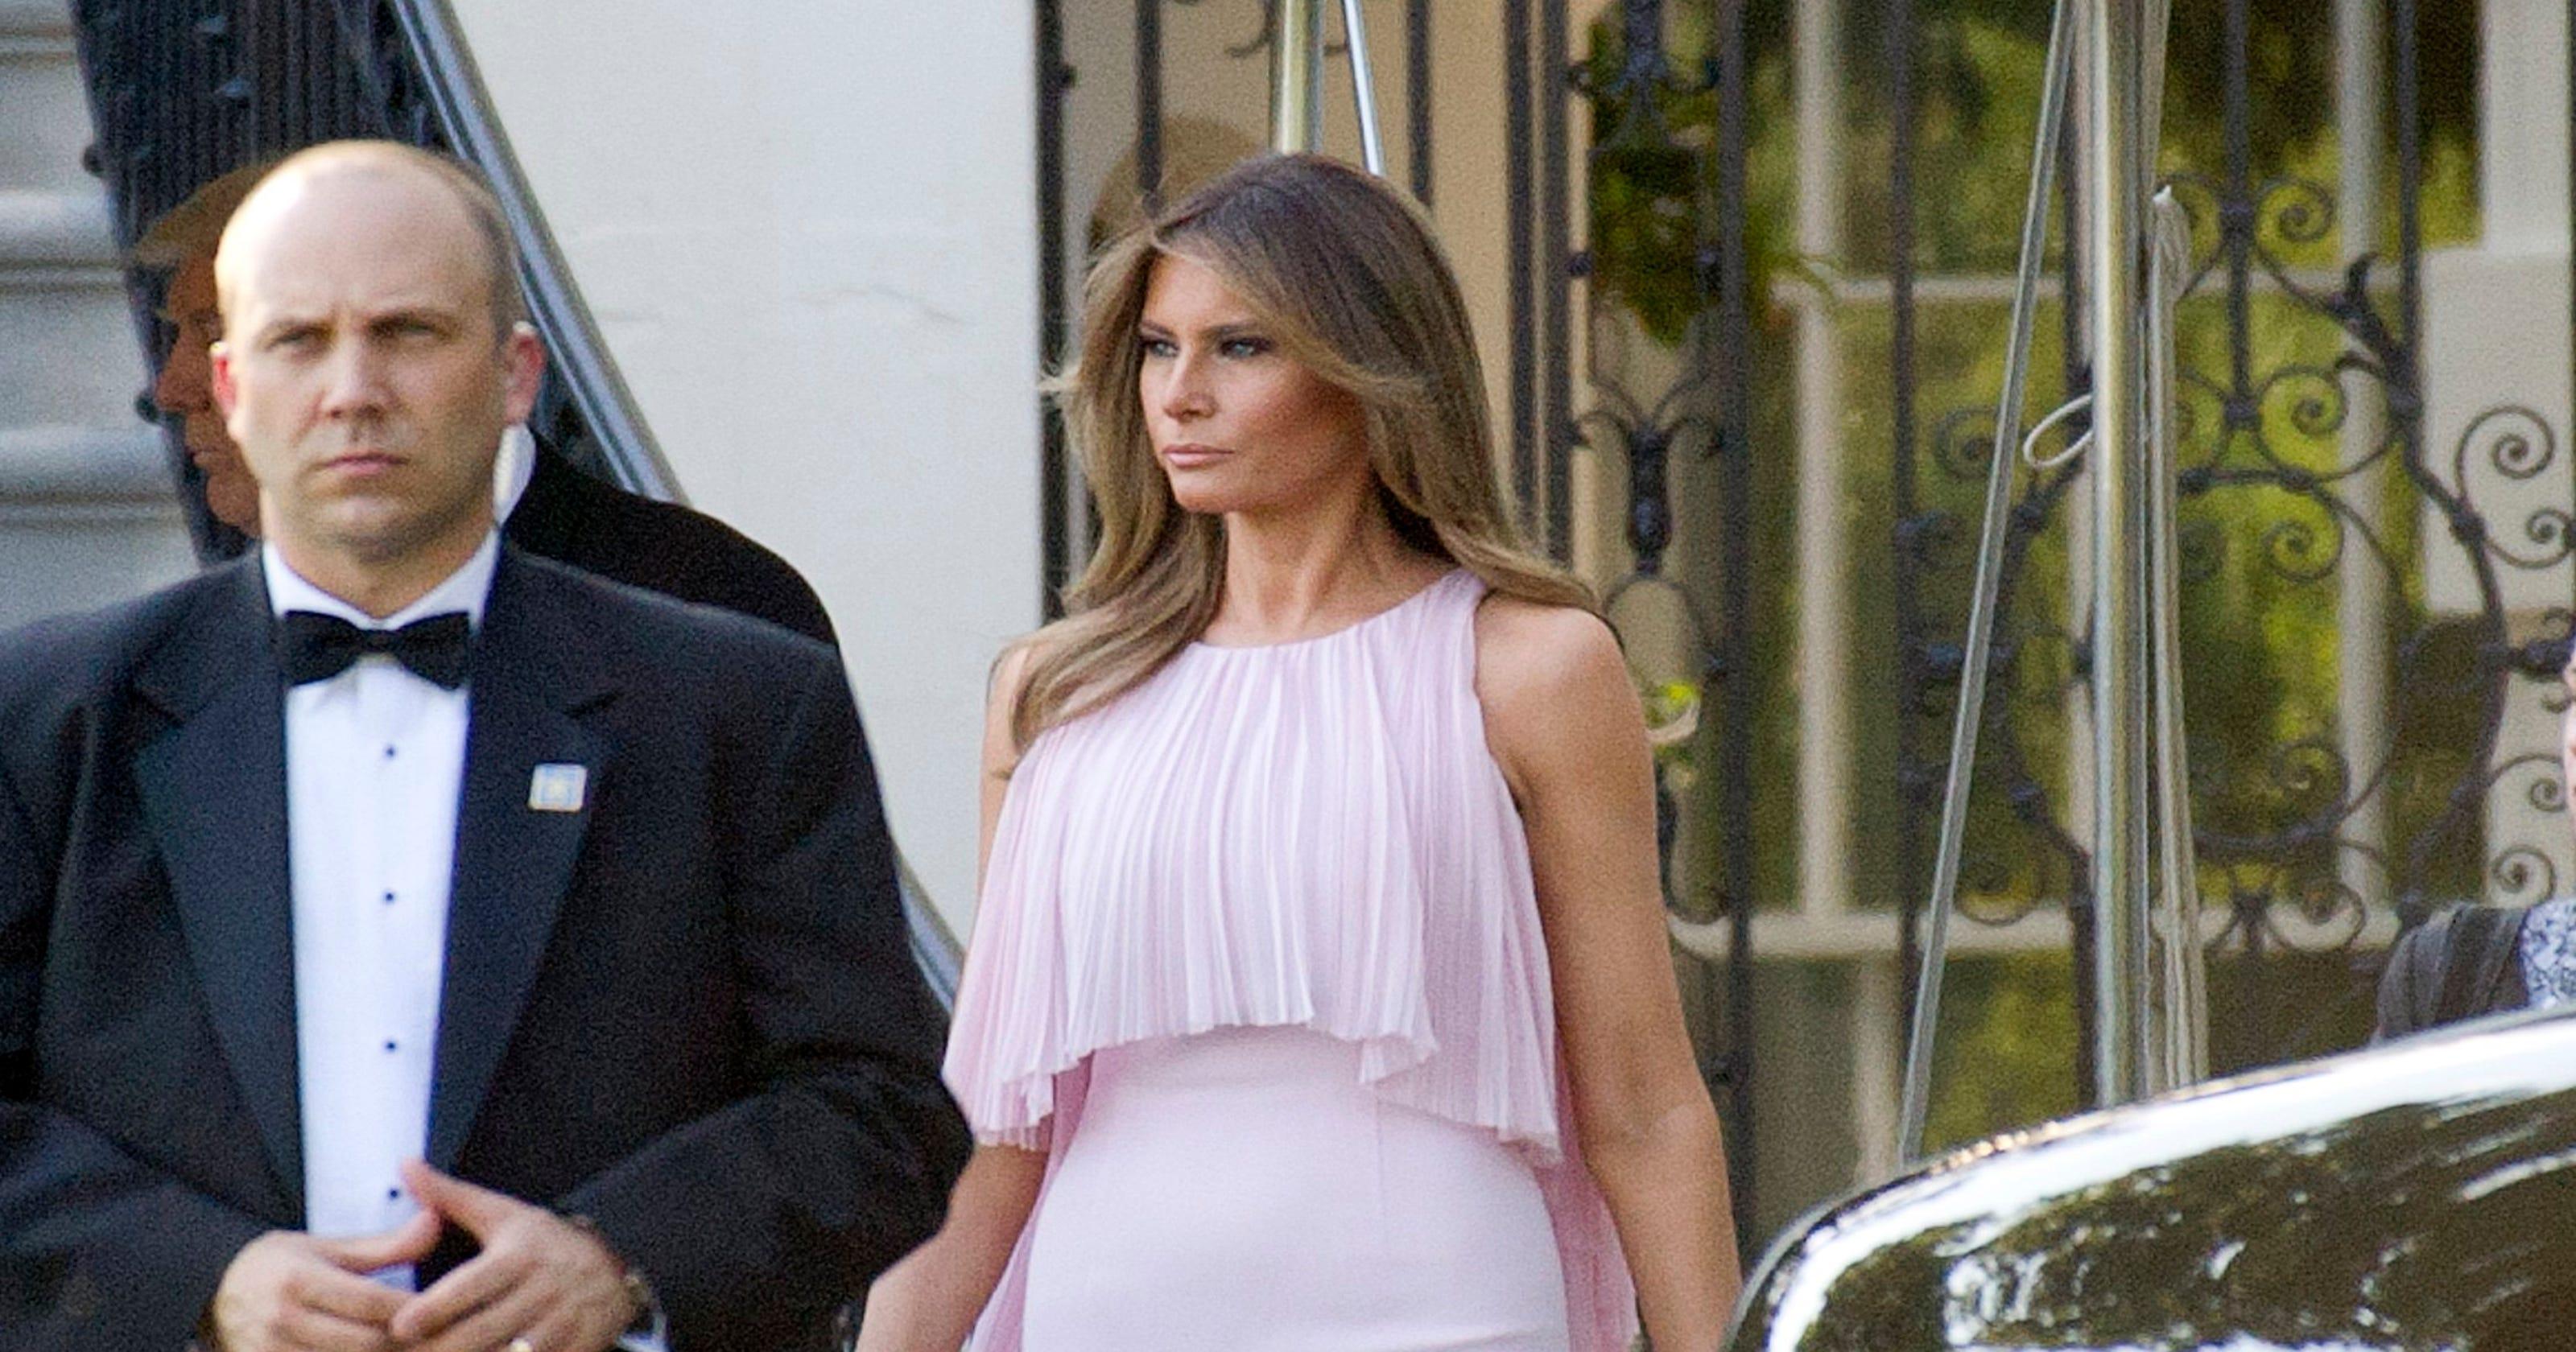 First lady fashion  Melania Trump wears pink to Washington wedding f57cd5c17